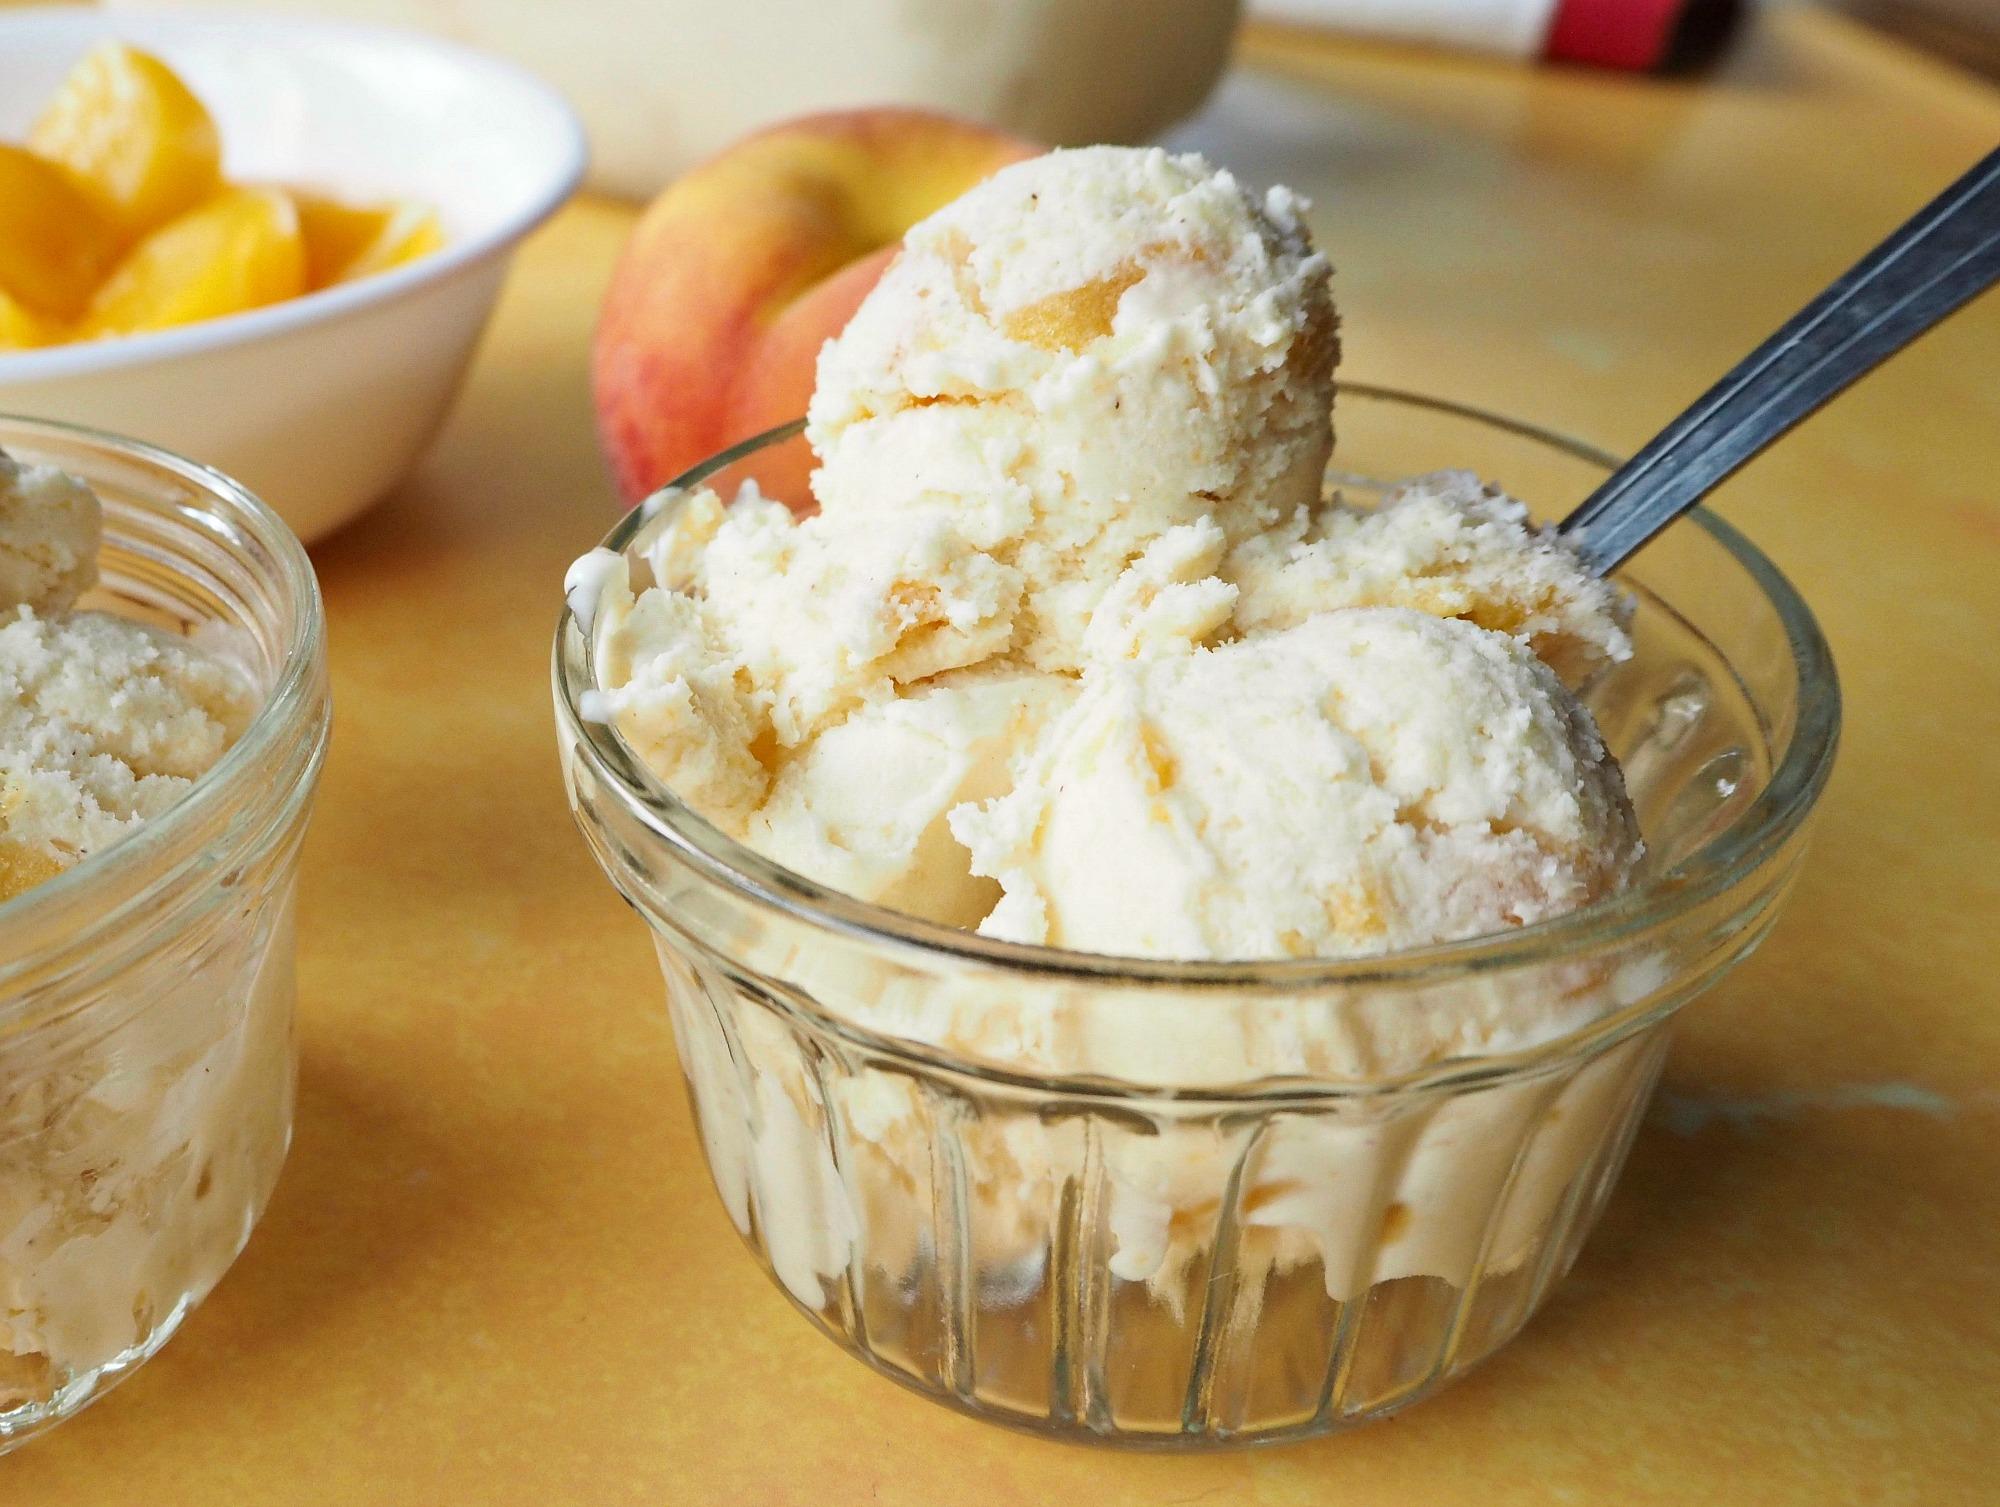 Chunky Peach Ice Cream recipe